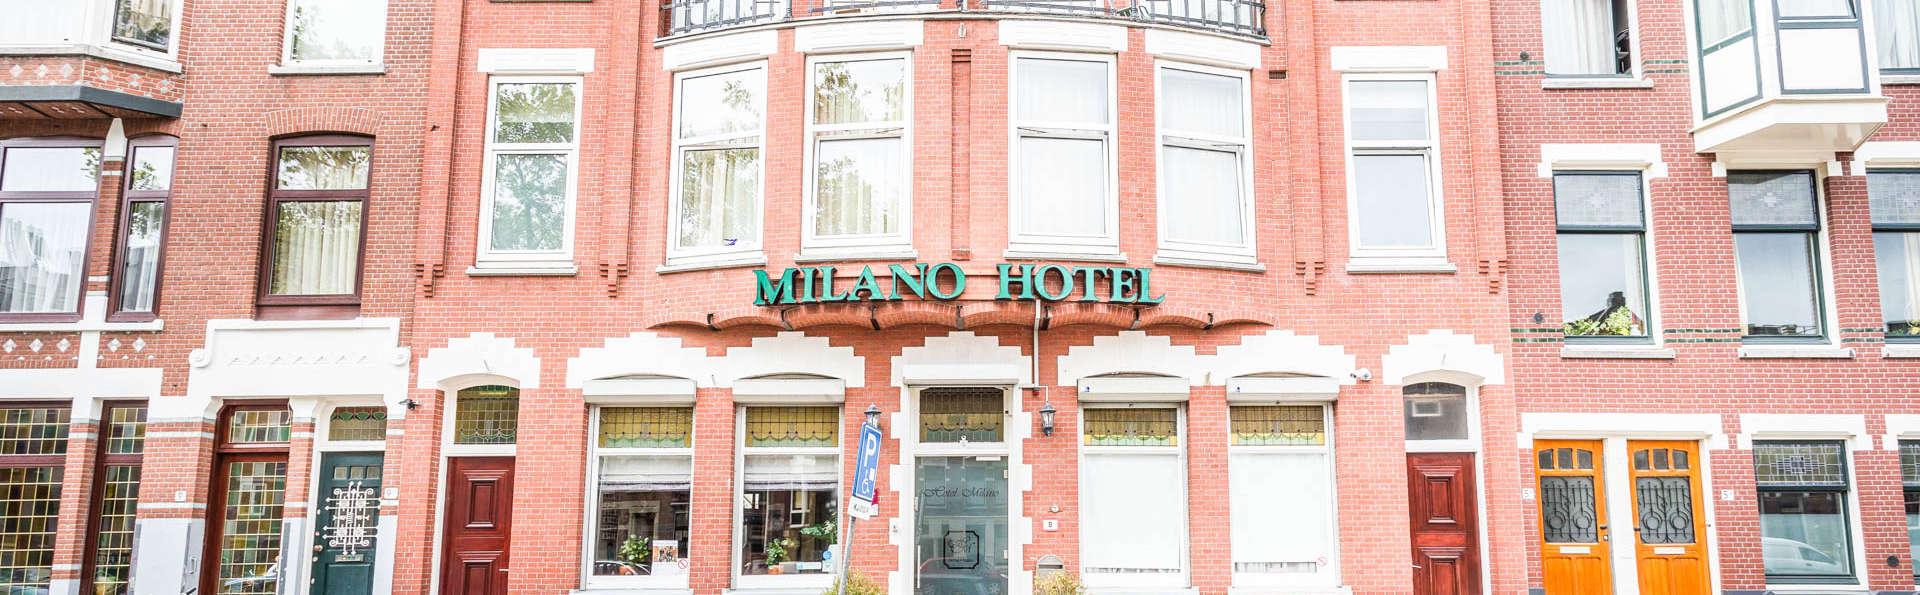 Hotel Milano Rotterdam - EDIT_N3_FRONT.jpg